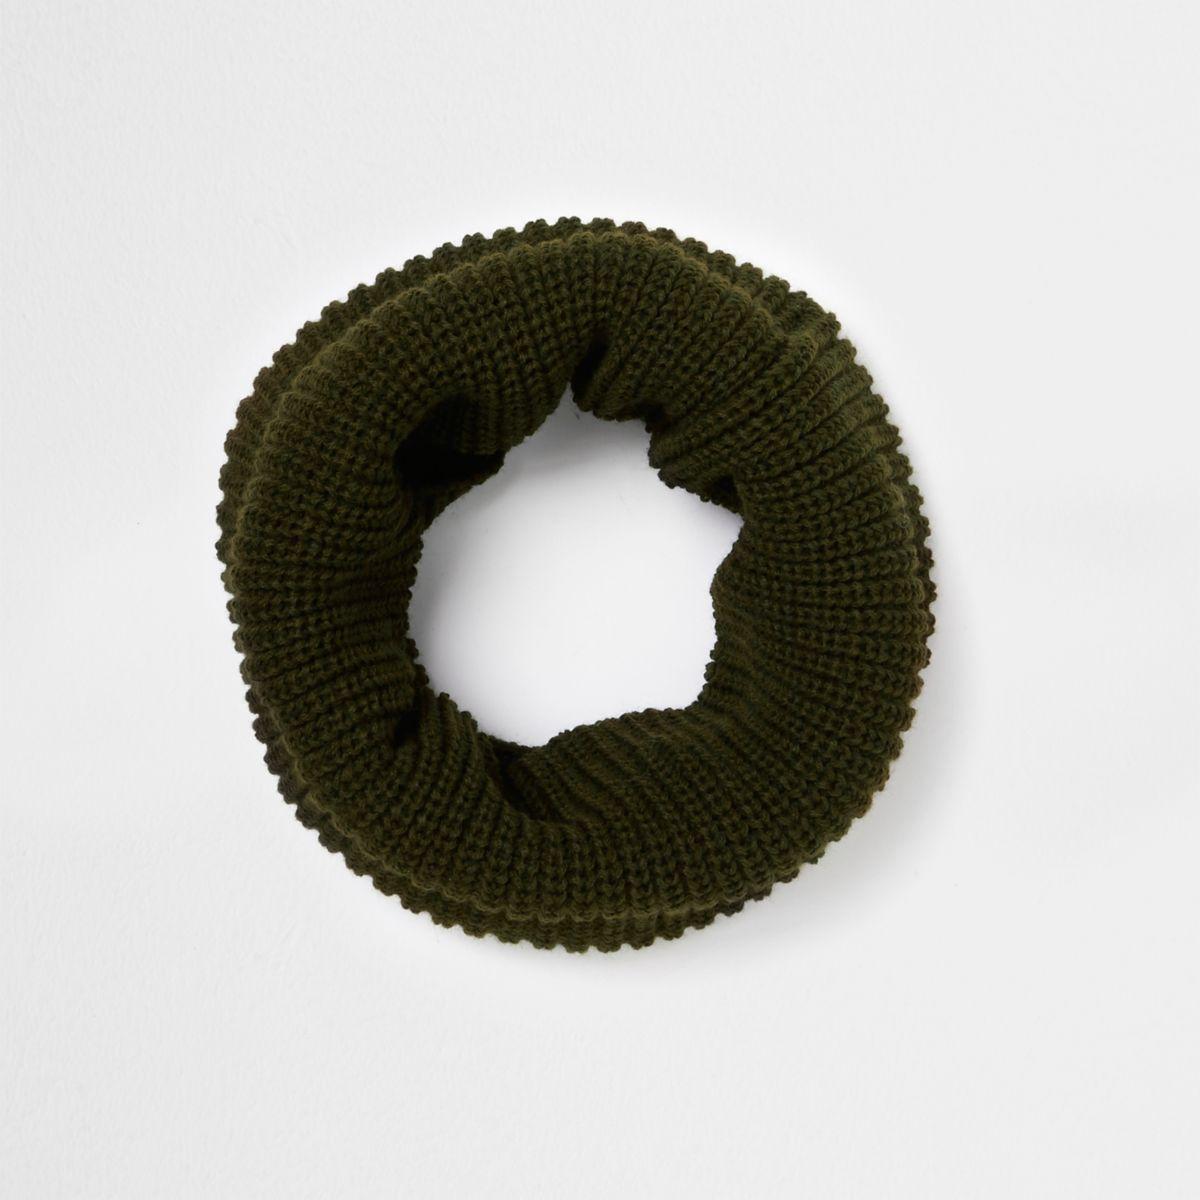 Khaki knit snood